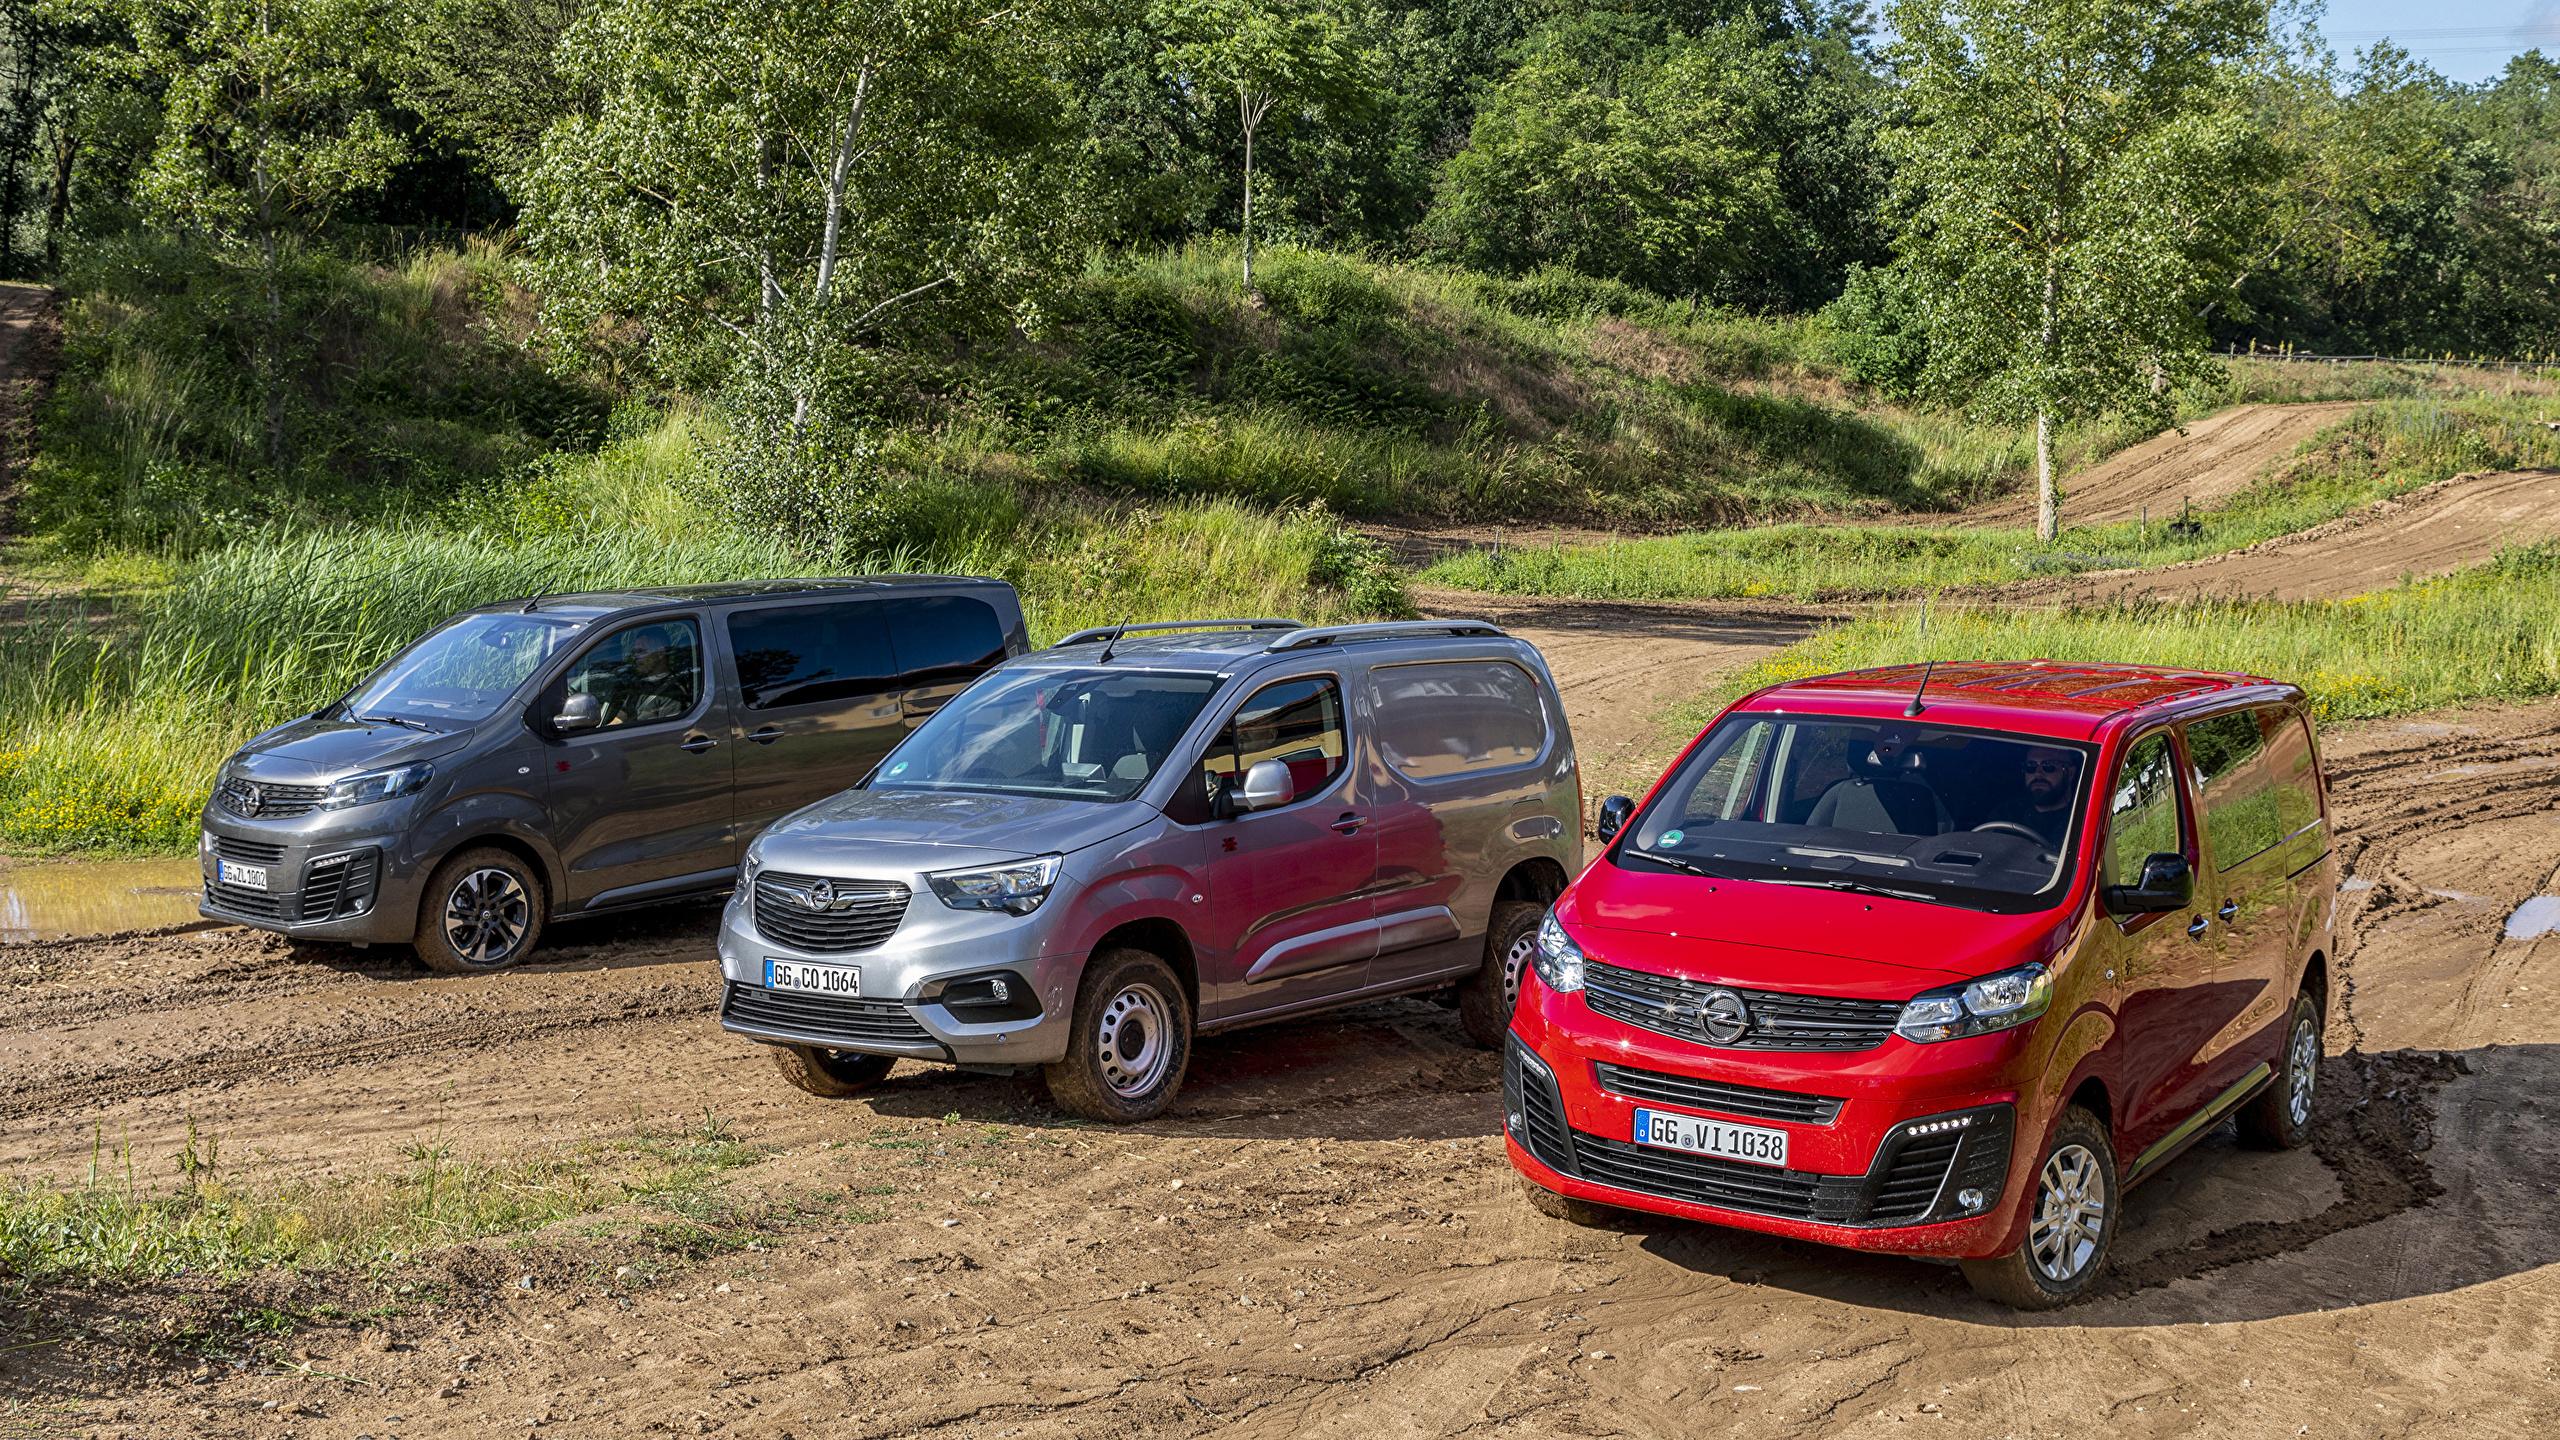 Foto Opel Combo Cargo, Zafira Life, Vivaro Ein Van Autos Drei 3 Metallisch 2560x1440 auto automobil